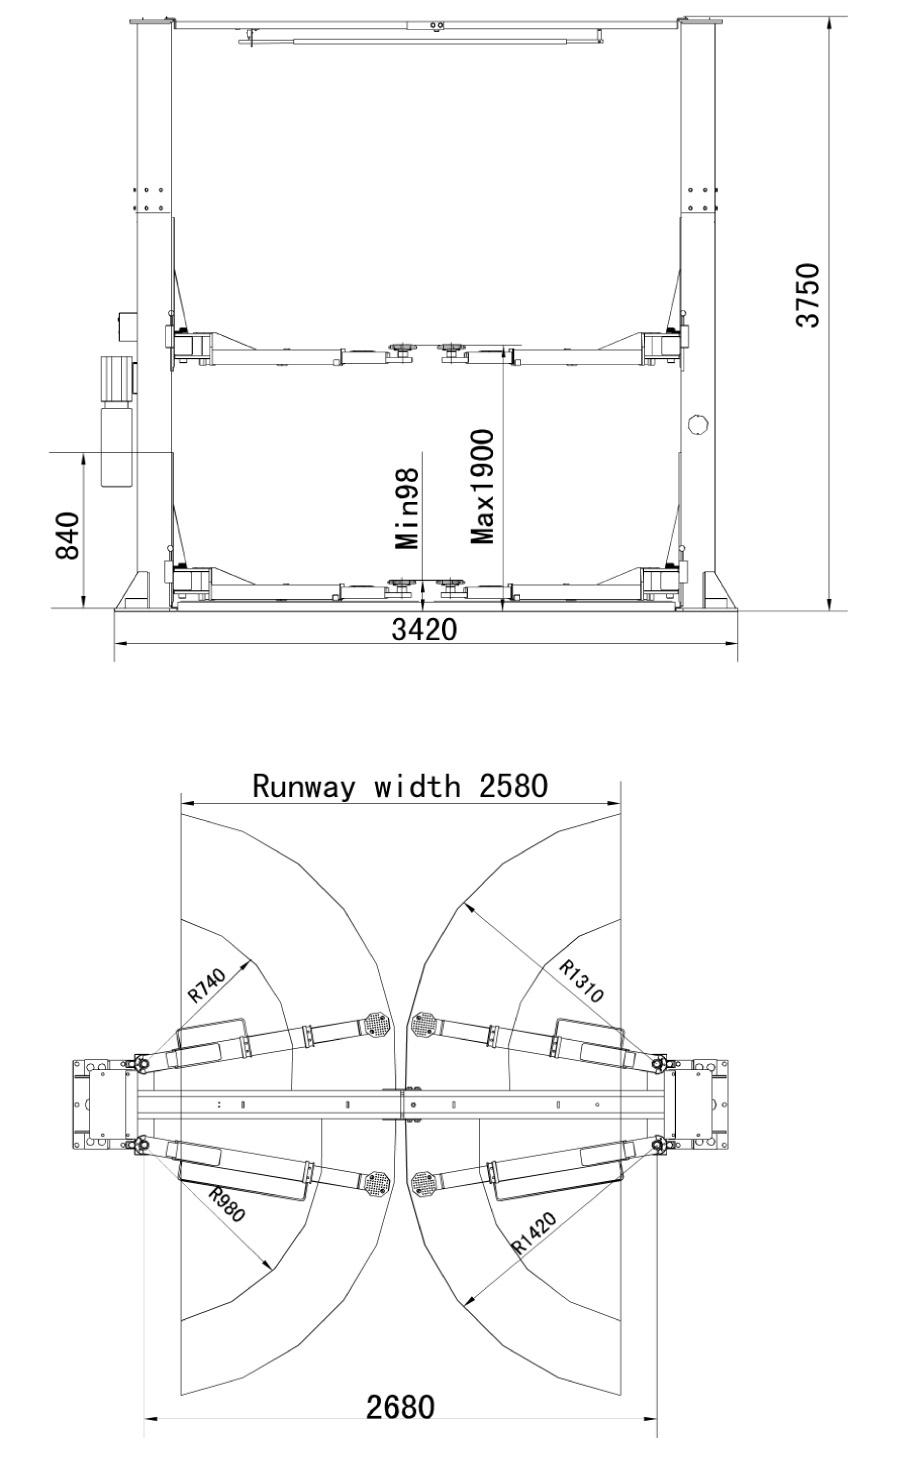 As 6240ta Twin Hydraulic Ram Clear Floor 2 Post Lift Automotech Diagram Previousplaynext